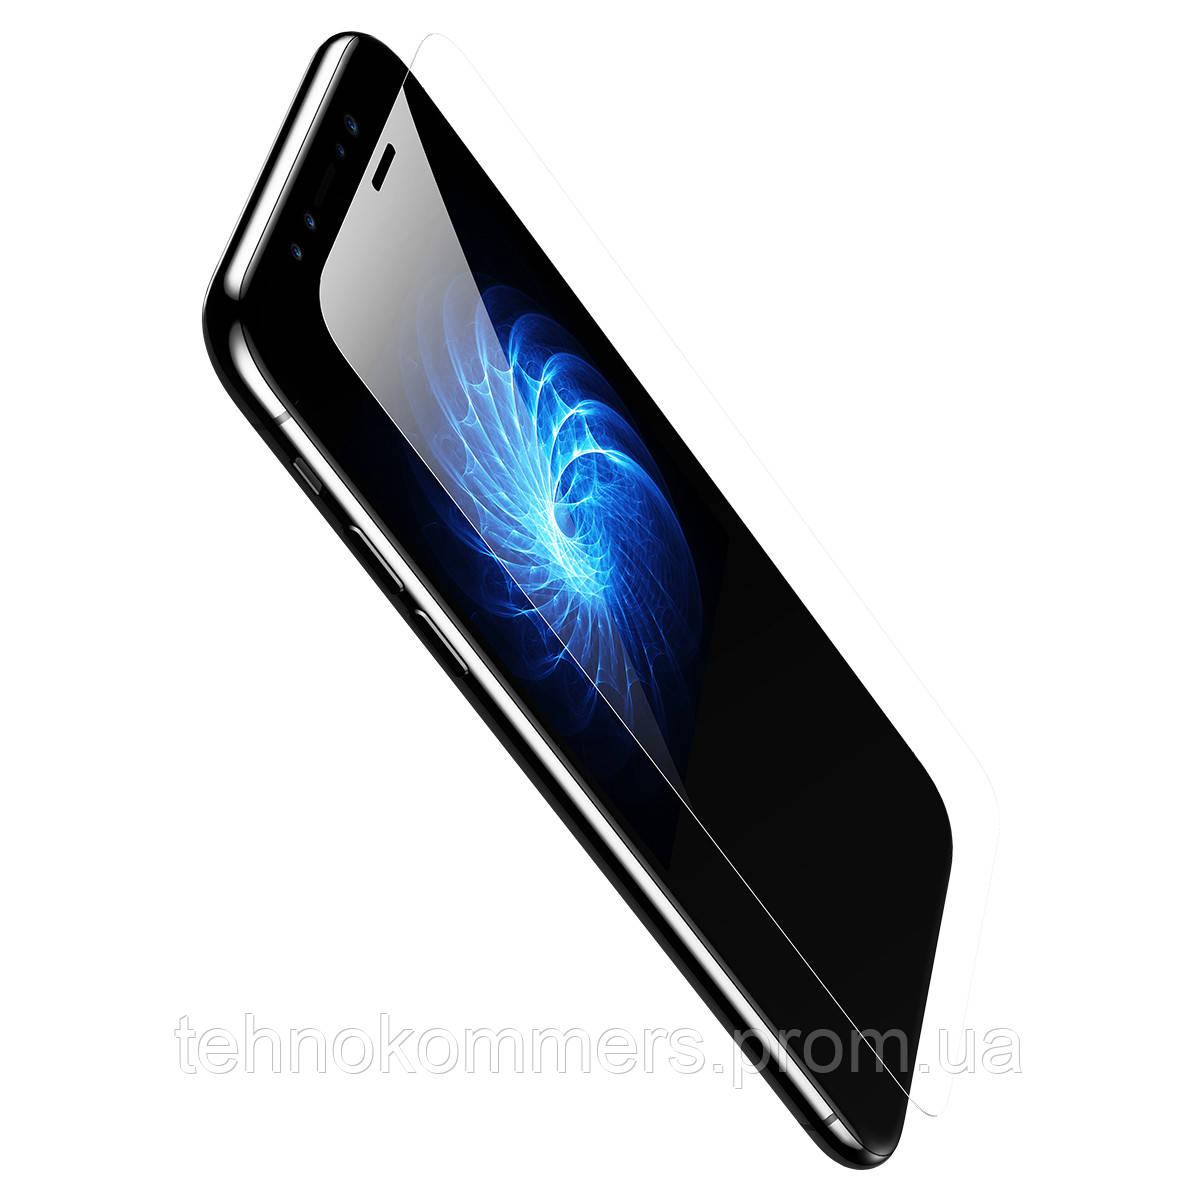 Захисне скло Baseus 0.15 mm Non-full Tempered Glass Film for iPhone X